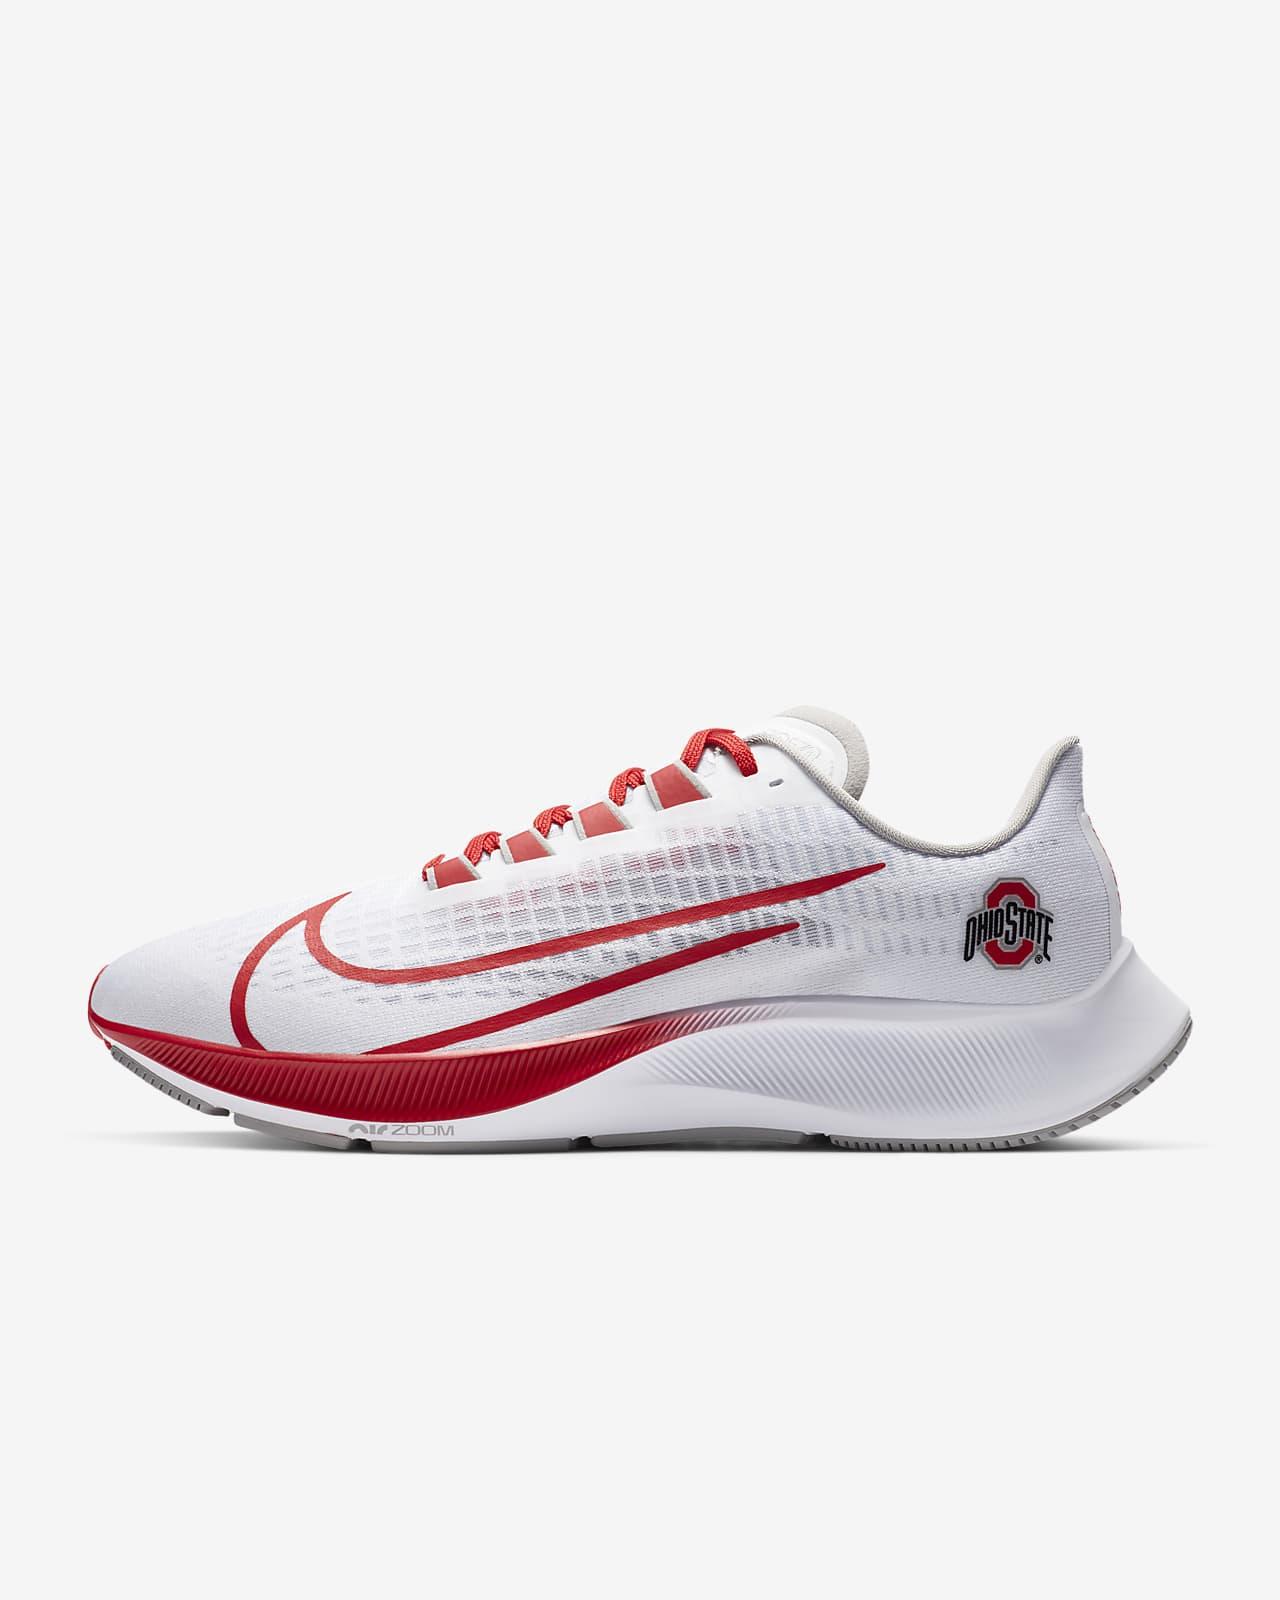 Calzado de running Nike College Zoom Pegasus 37 (Ohio State)